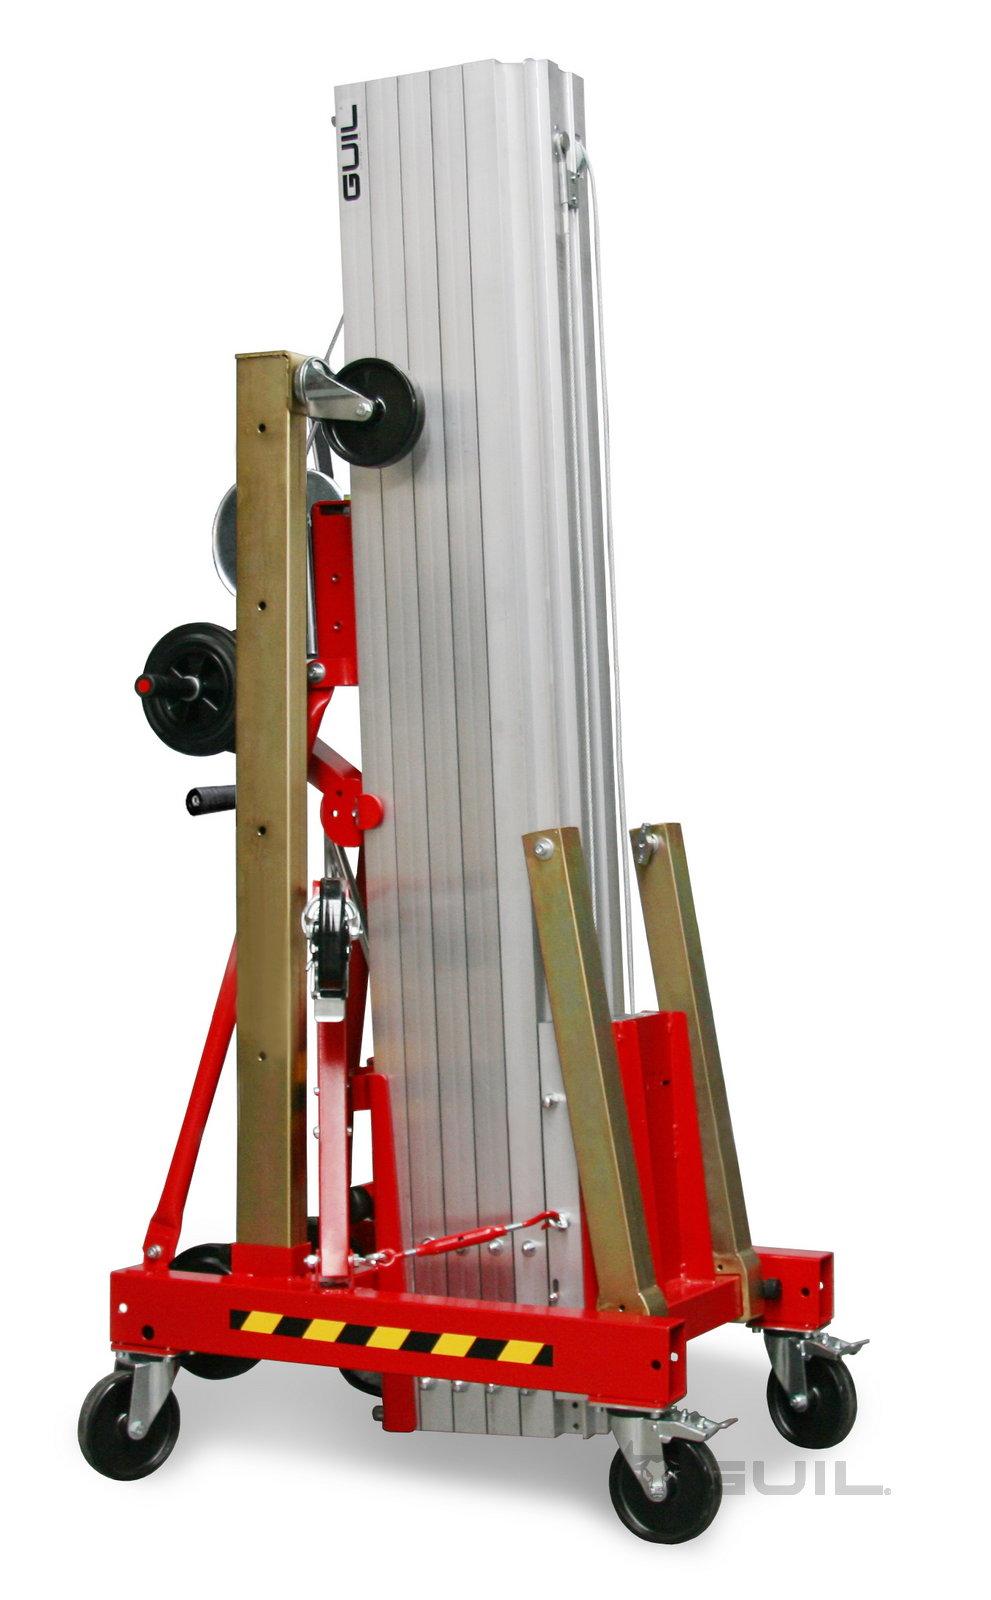 Kanaallift 6,5 m 400 kg (dutch) (3)